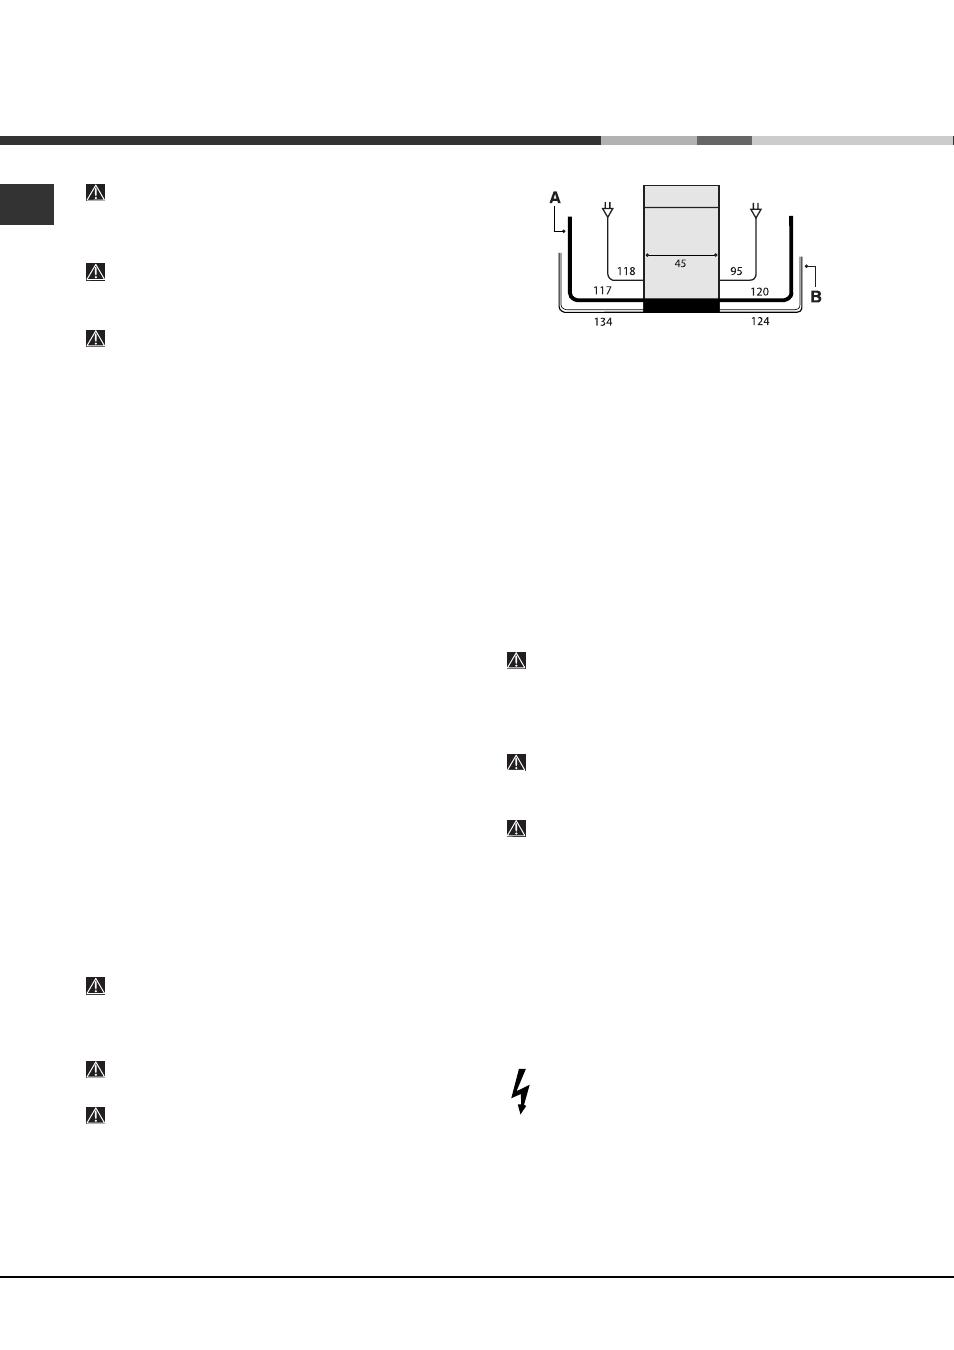 Посудомоечная Машина Hotpoint Ariston Lsf 7237 инструкция - картинка 1